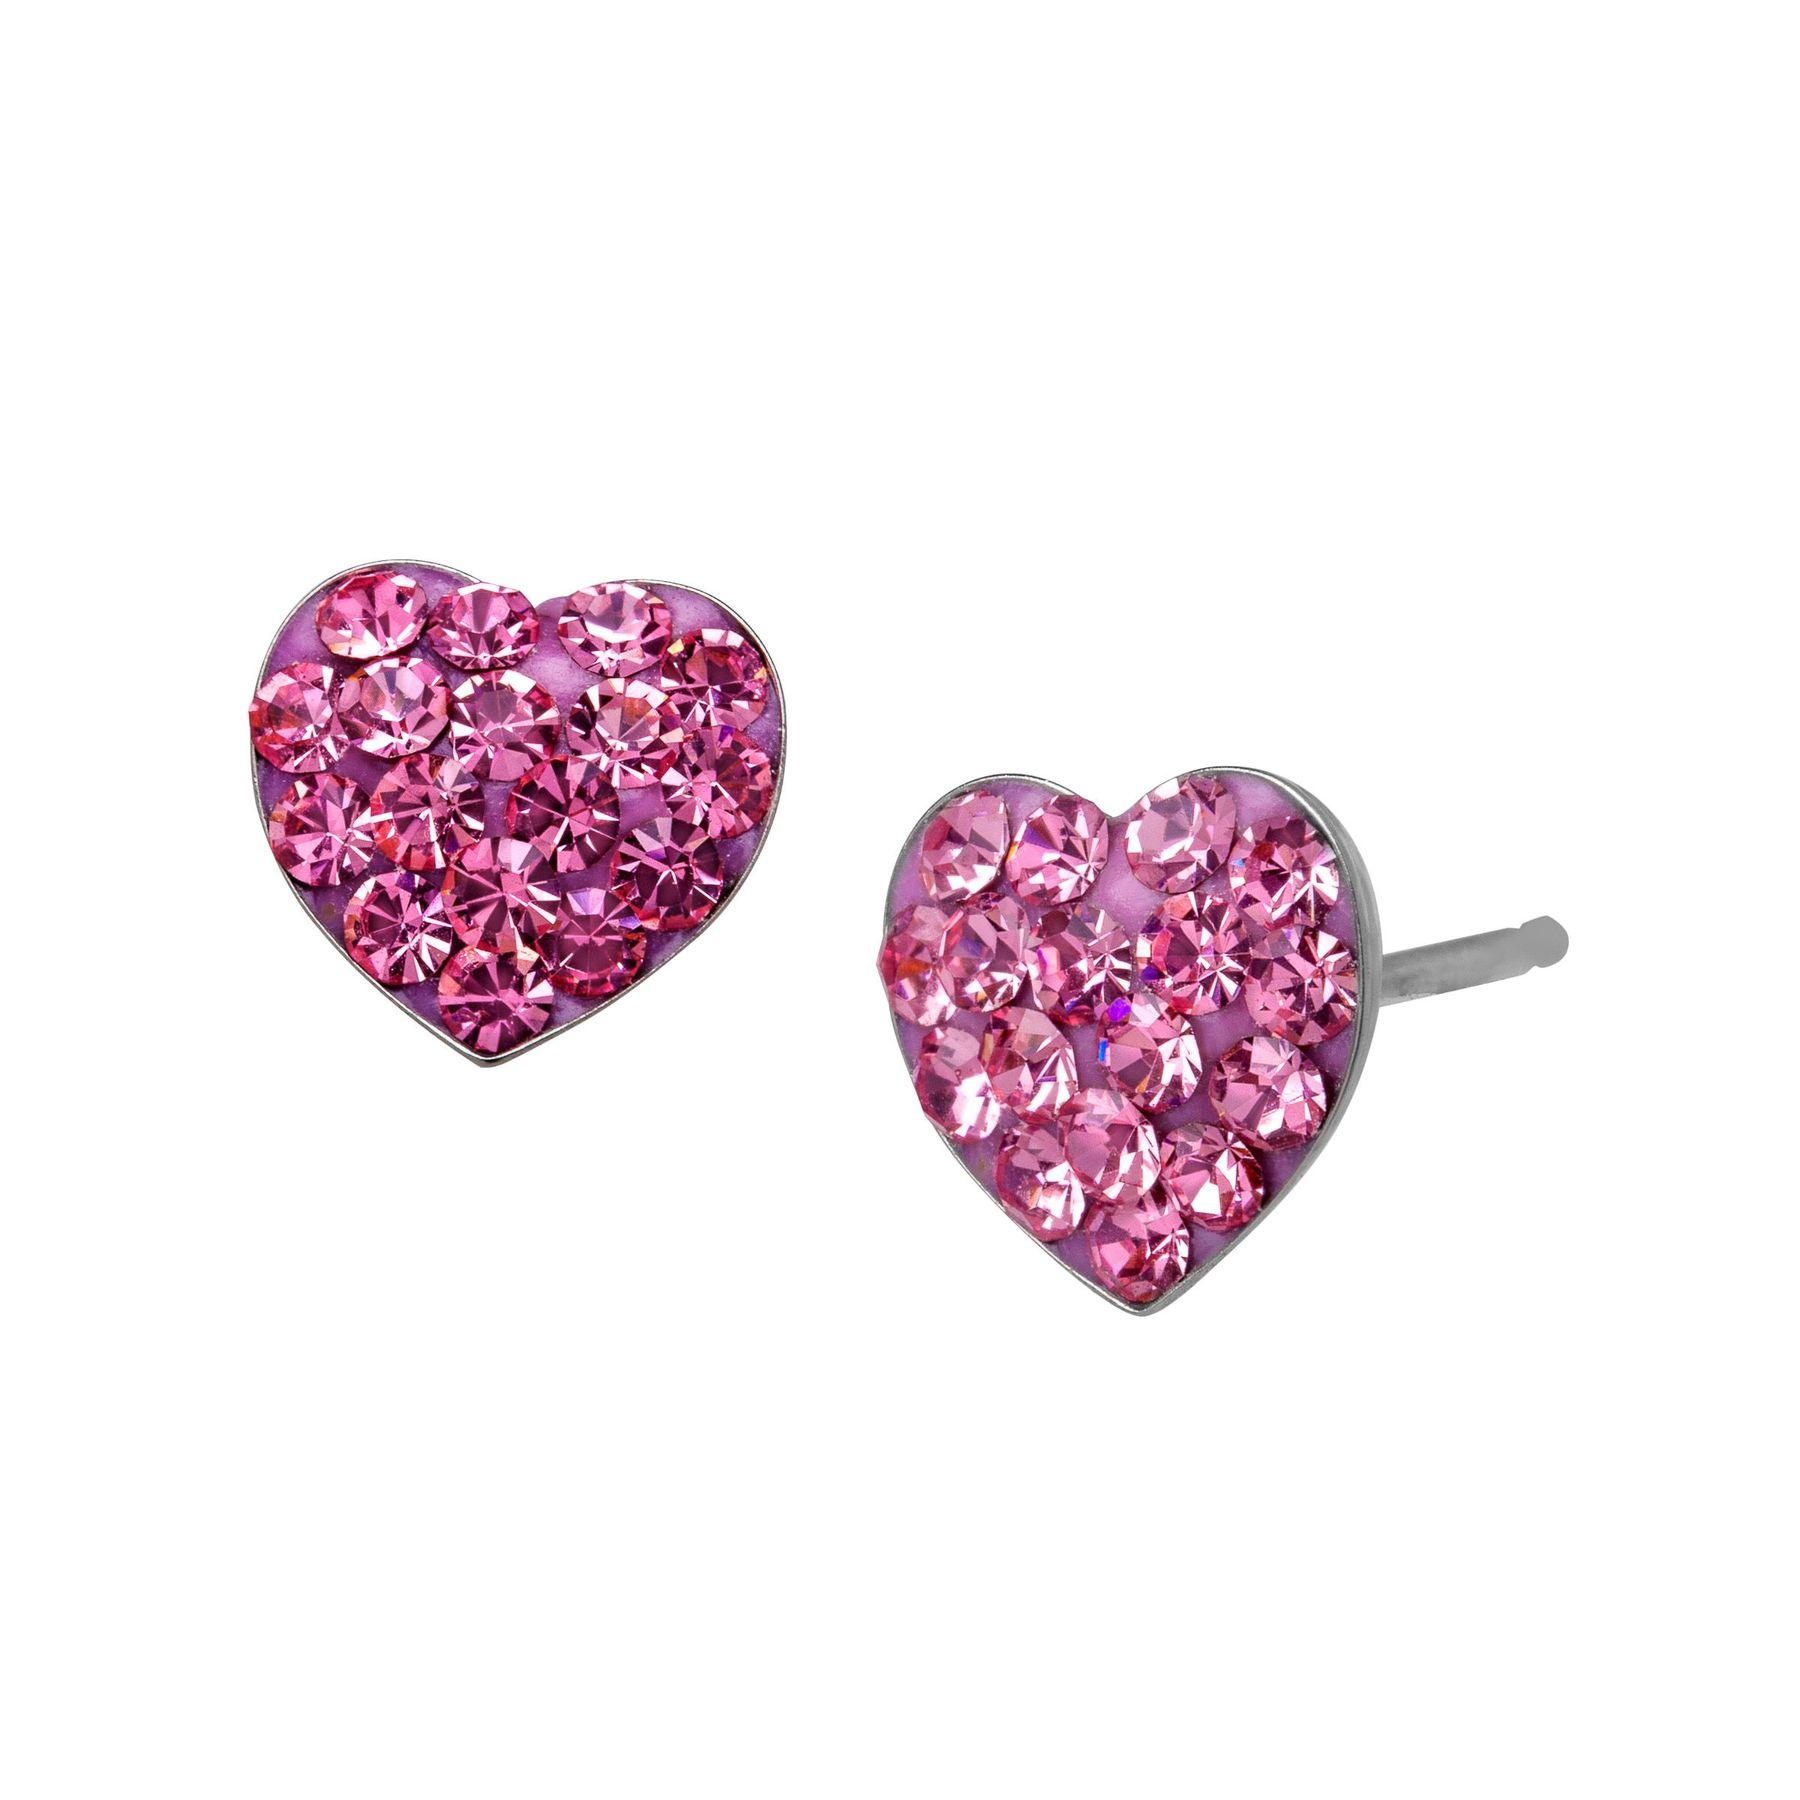 Heart Stud Earrings With Swarovski Crystals